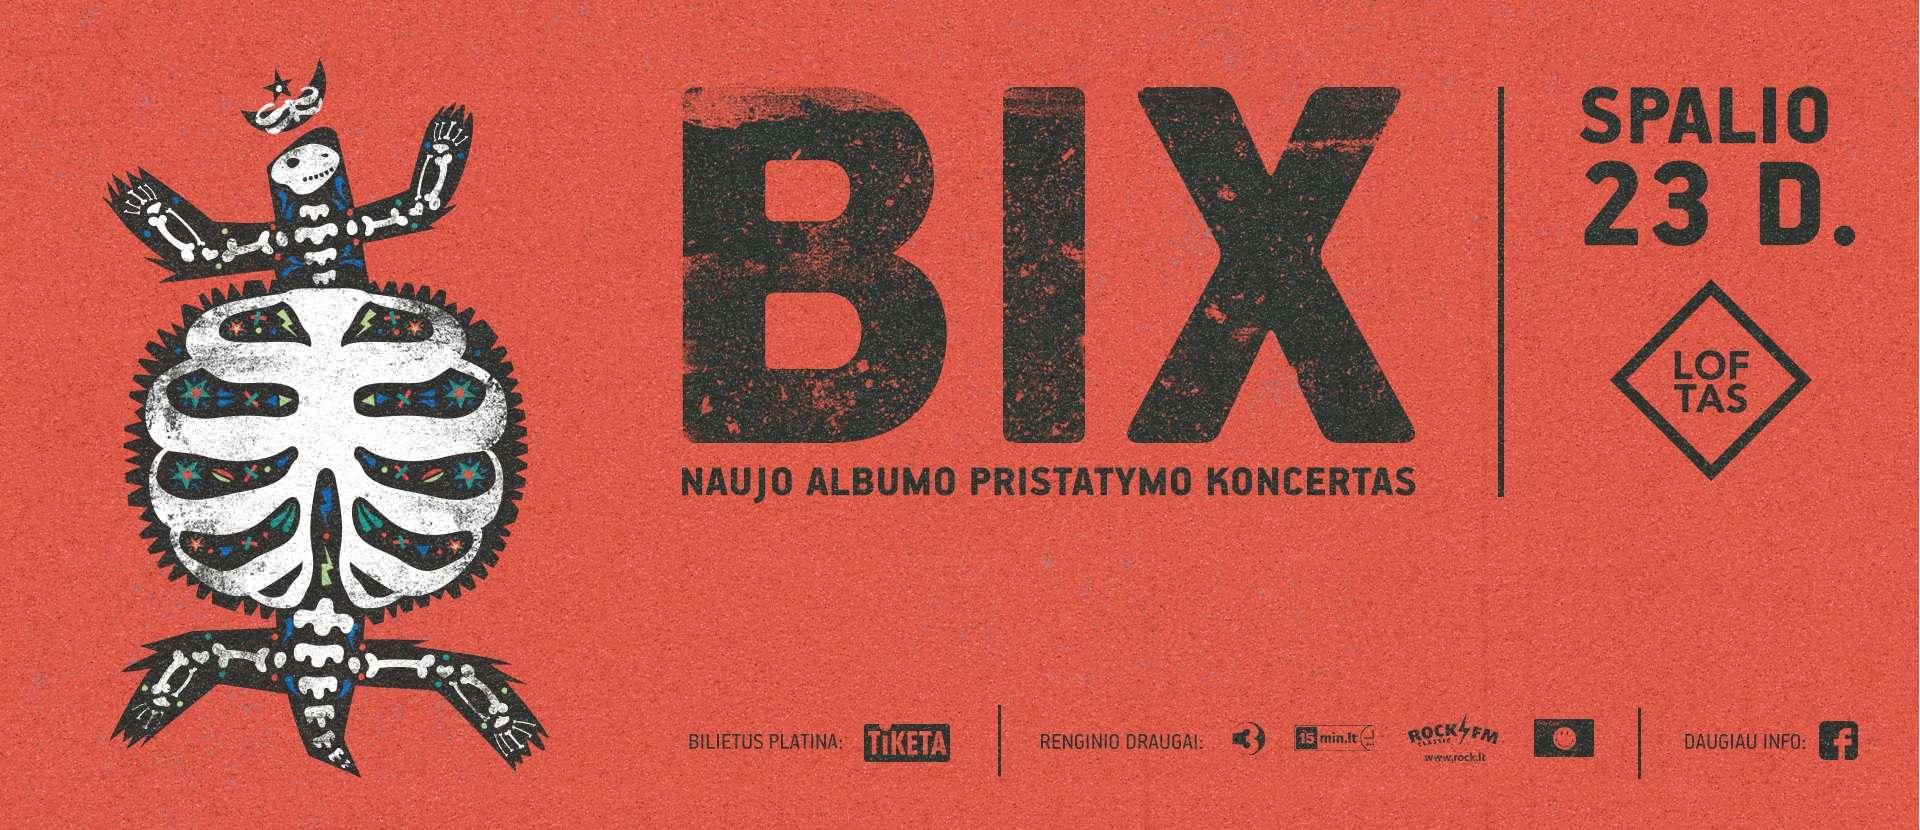 BIX naujo albumo pristatymo koncertas